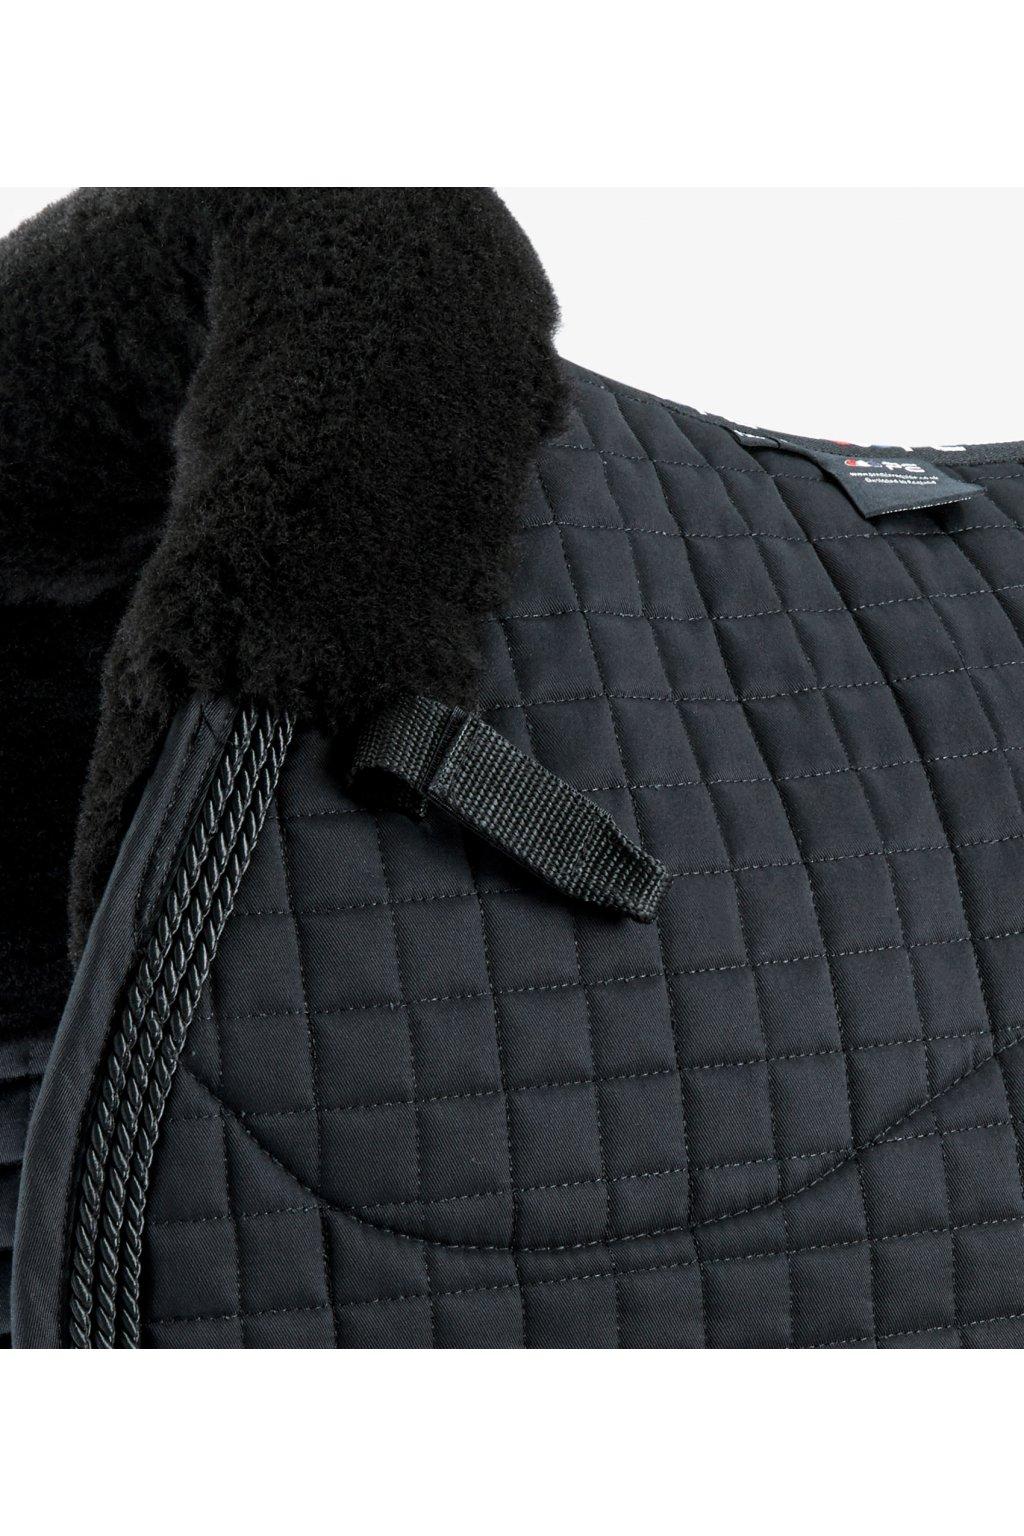 Podsedlovka Merino Wool European Square Pad VS/DR